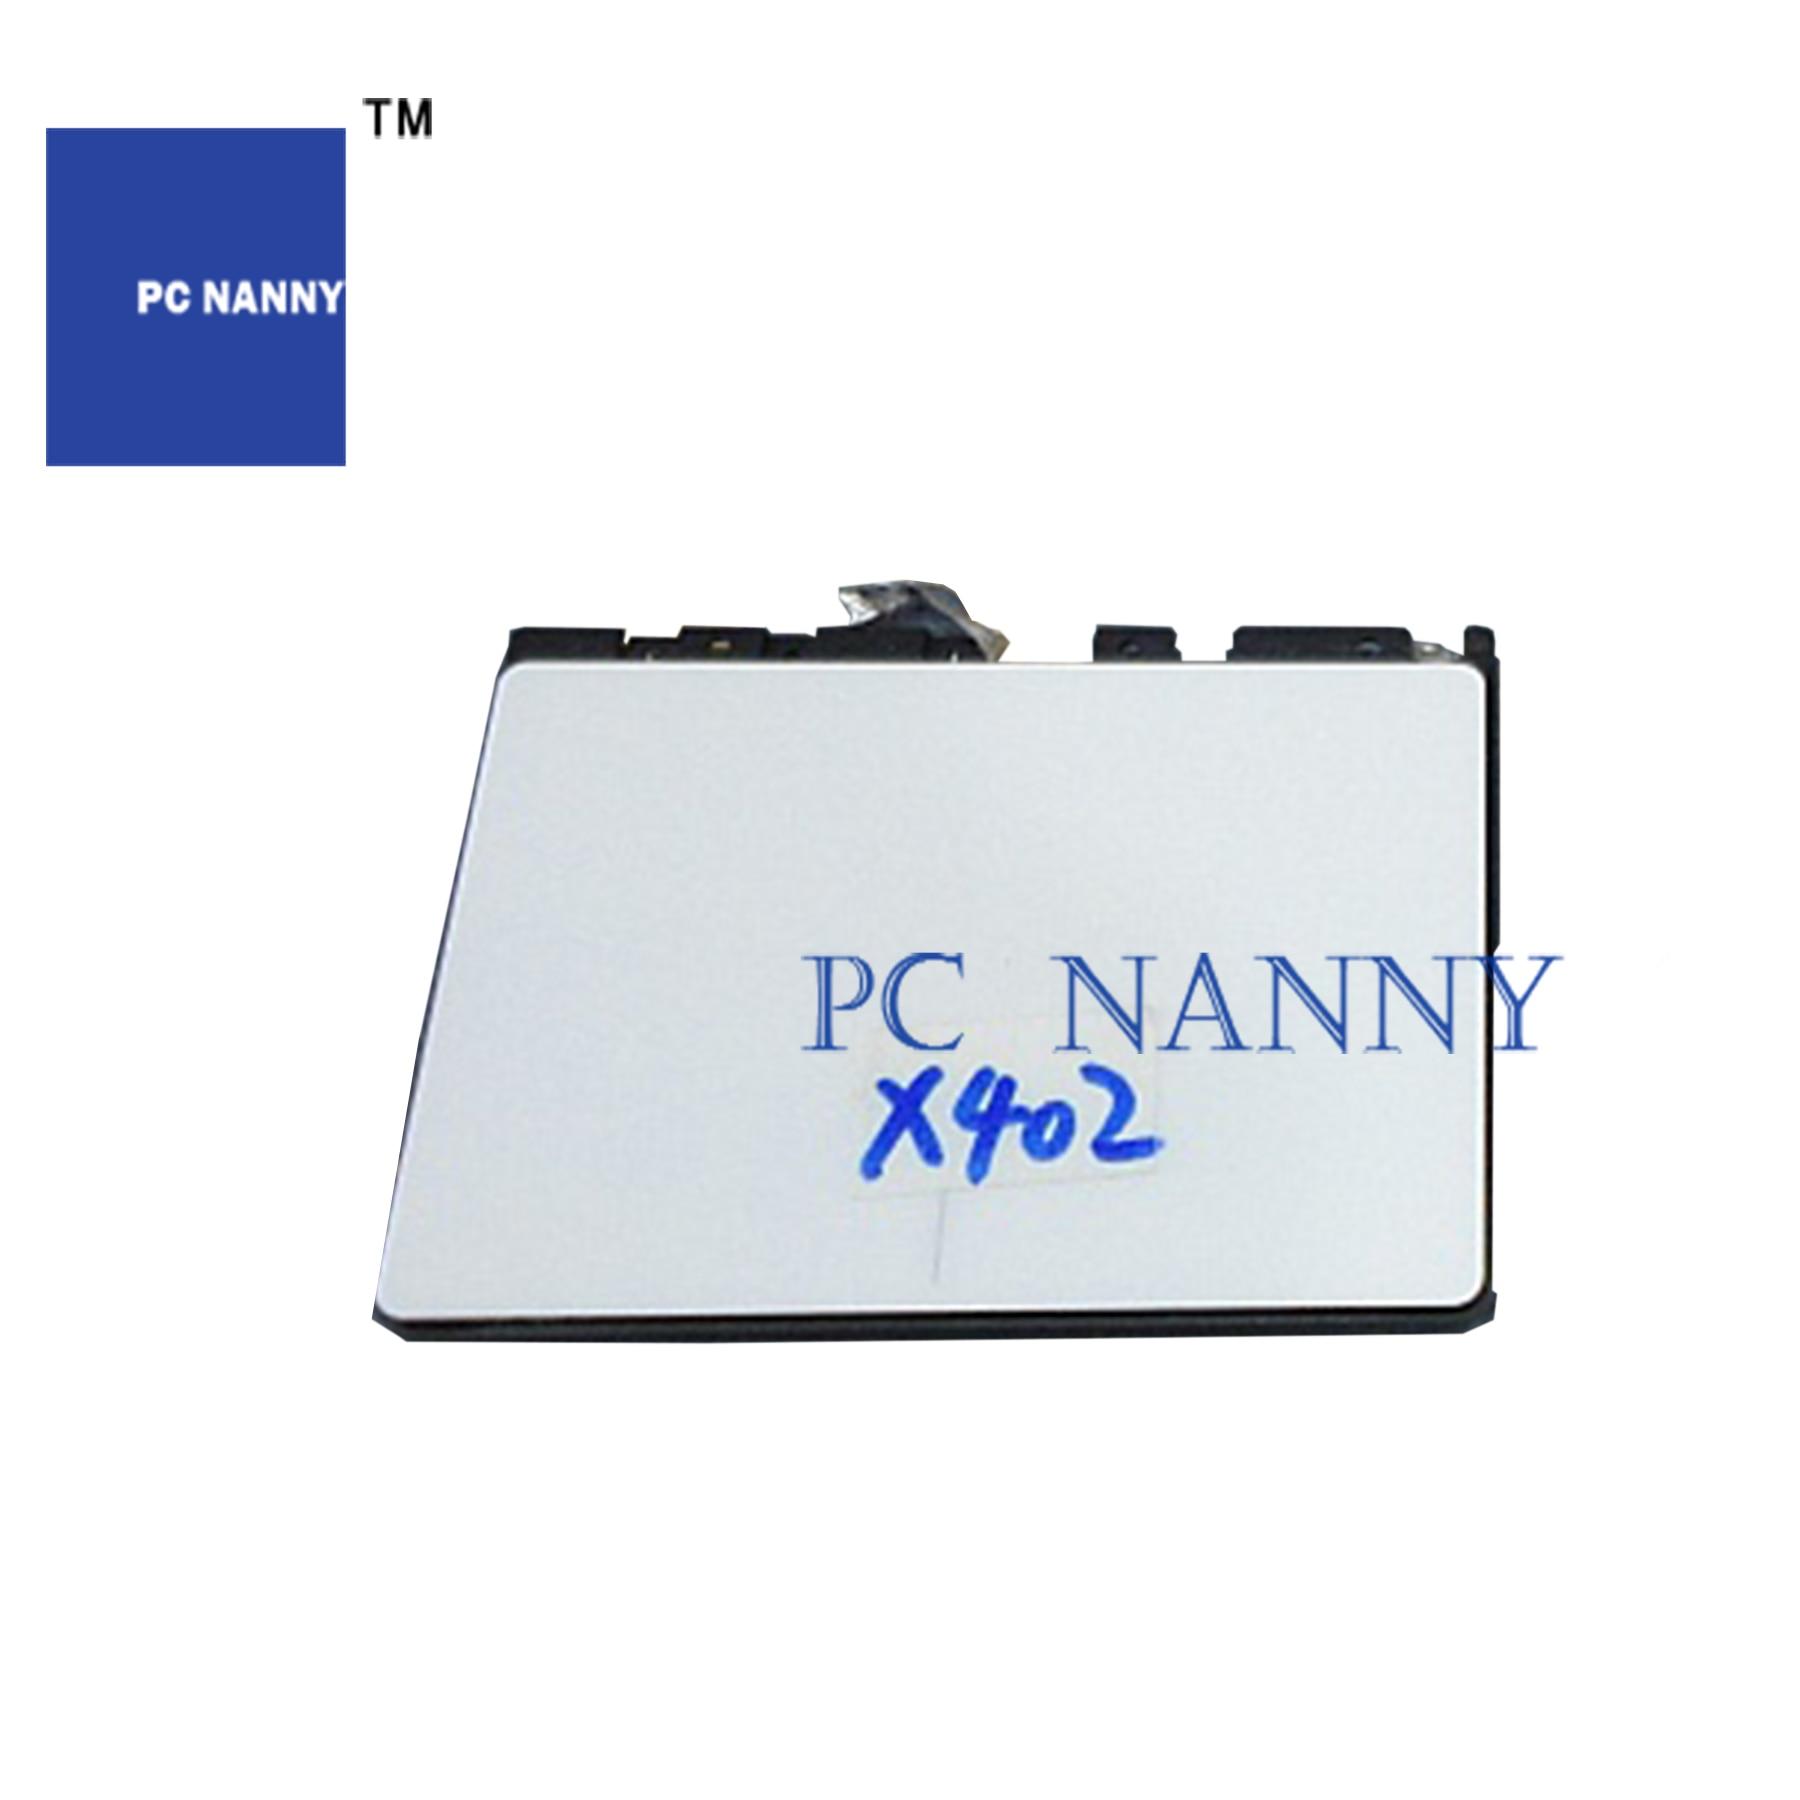 PCNANNY para ASUS X402C F402C X402CA touchpad prueba buena